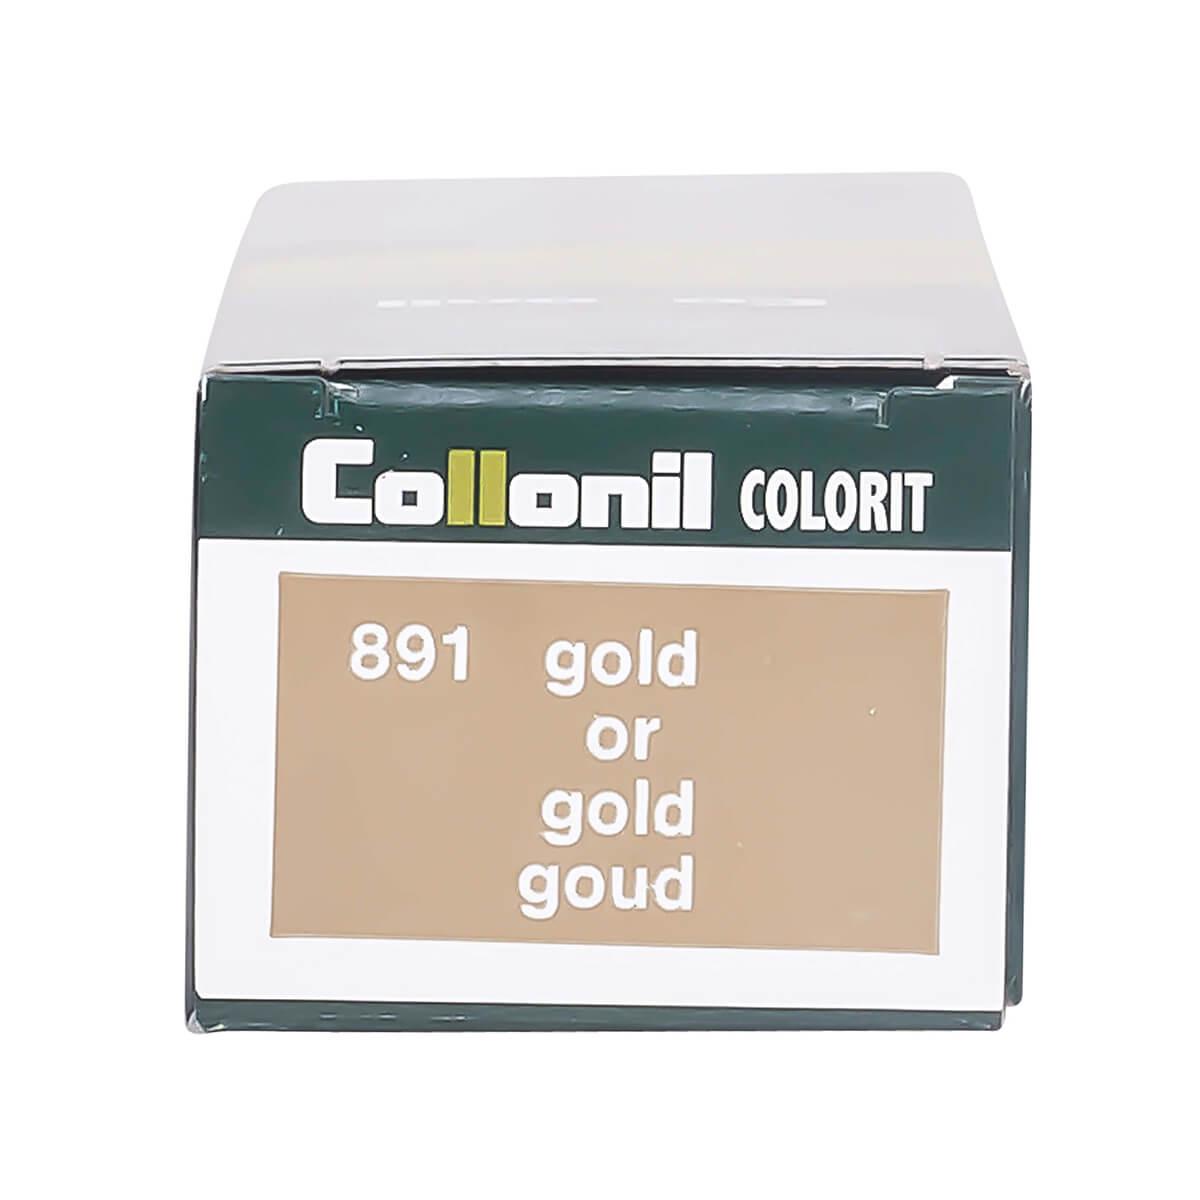 Collonil Creme COLORIT Gold